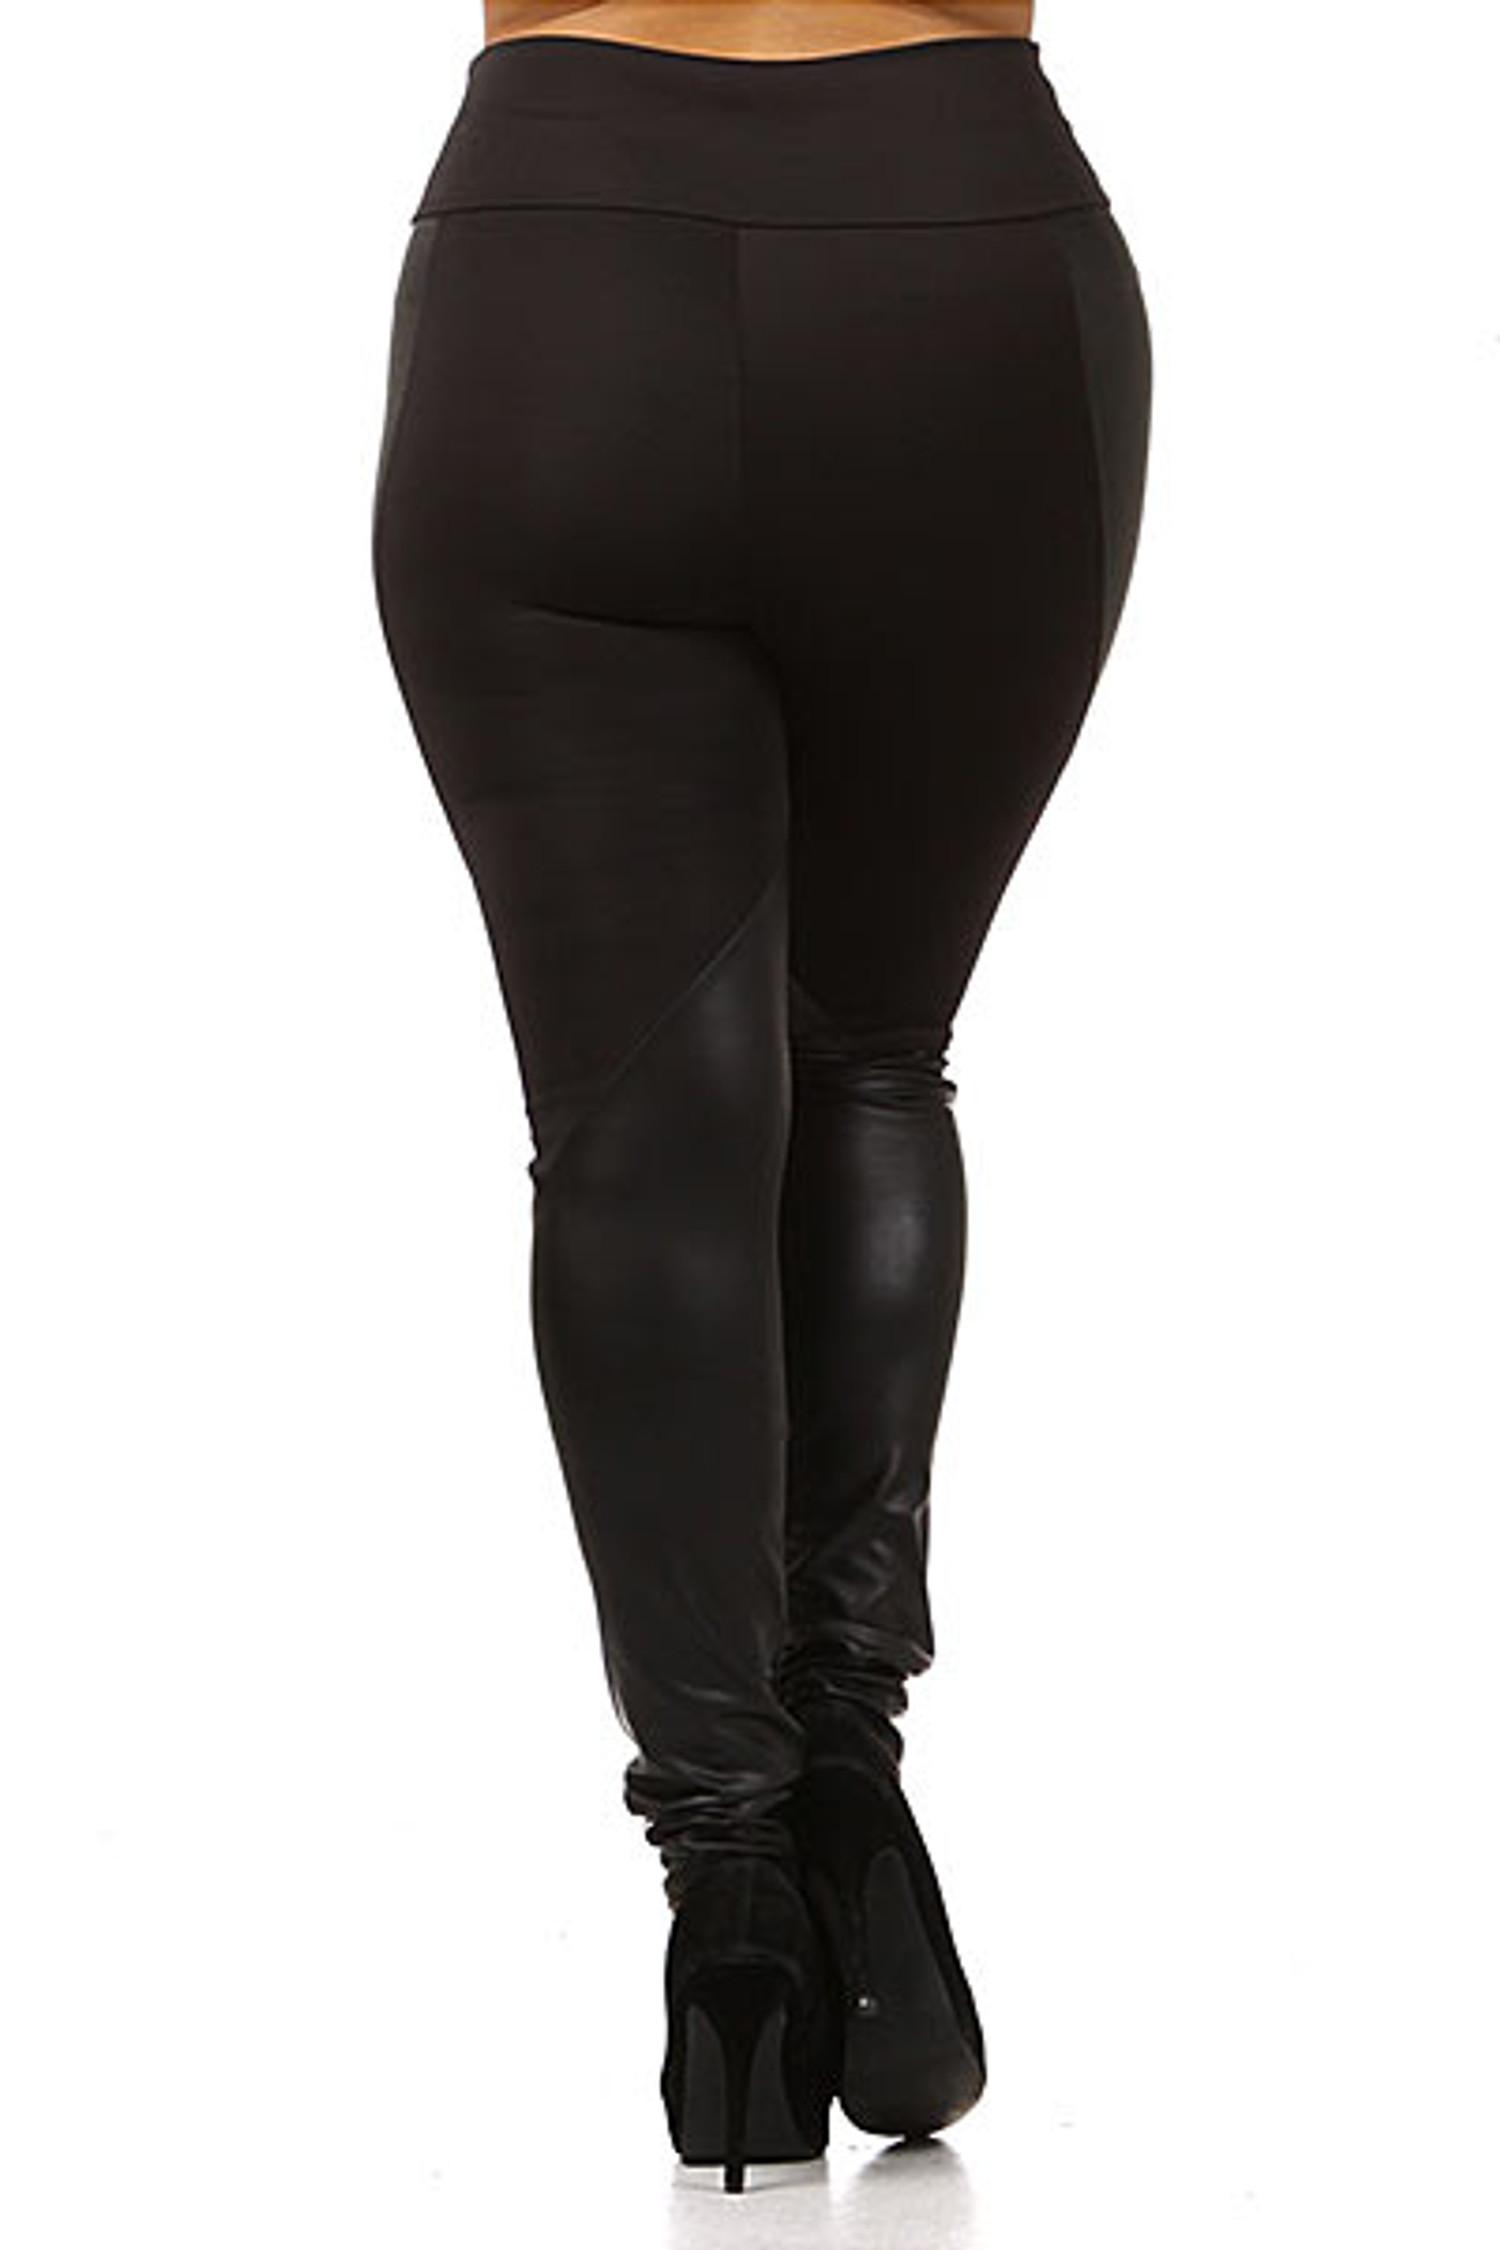 Chatelaine Faux Leather Leggings Plus Size